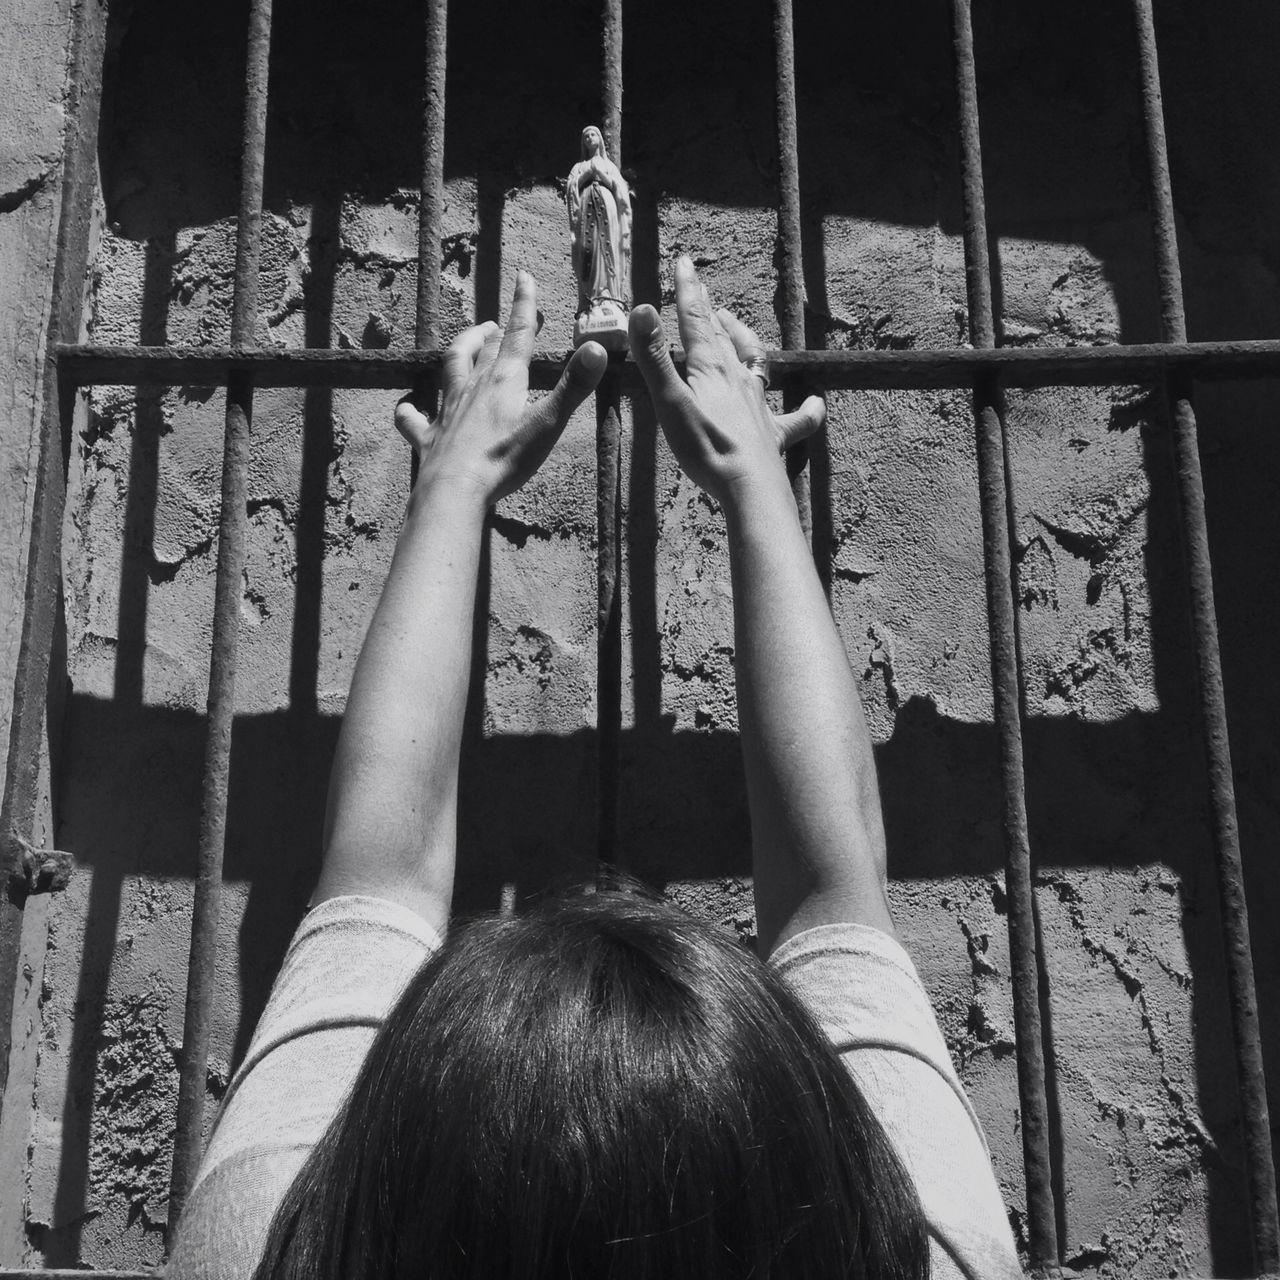 Woman praying before prison bars